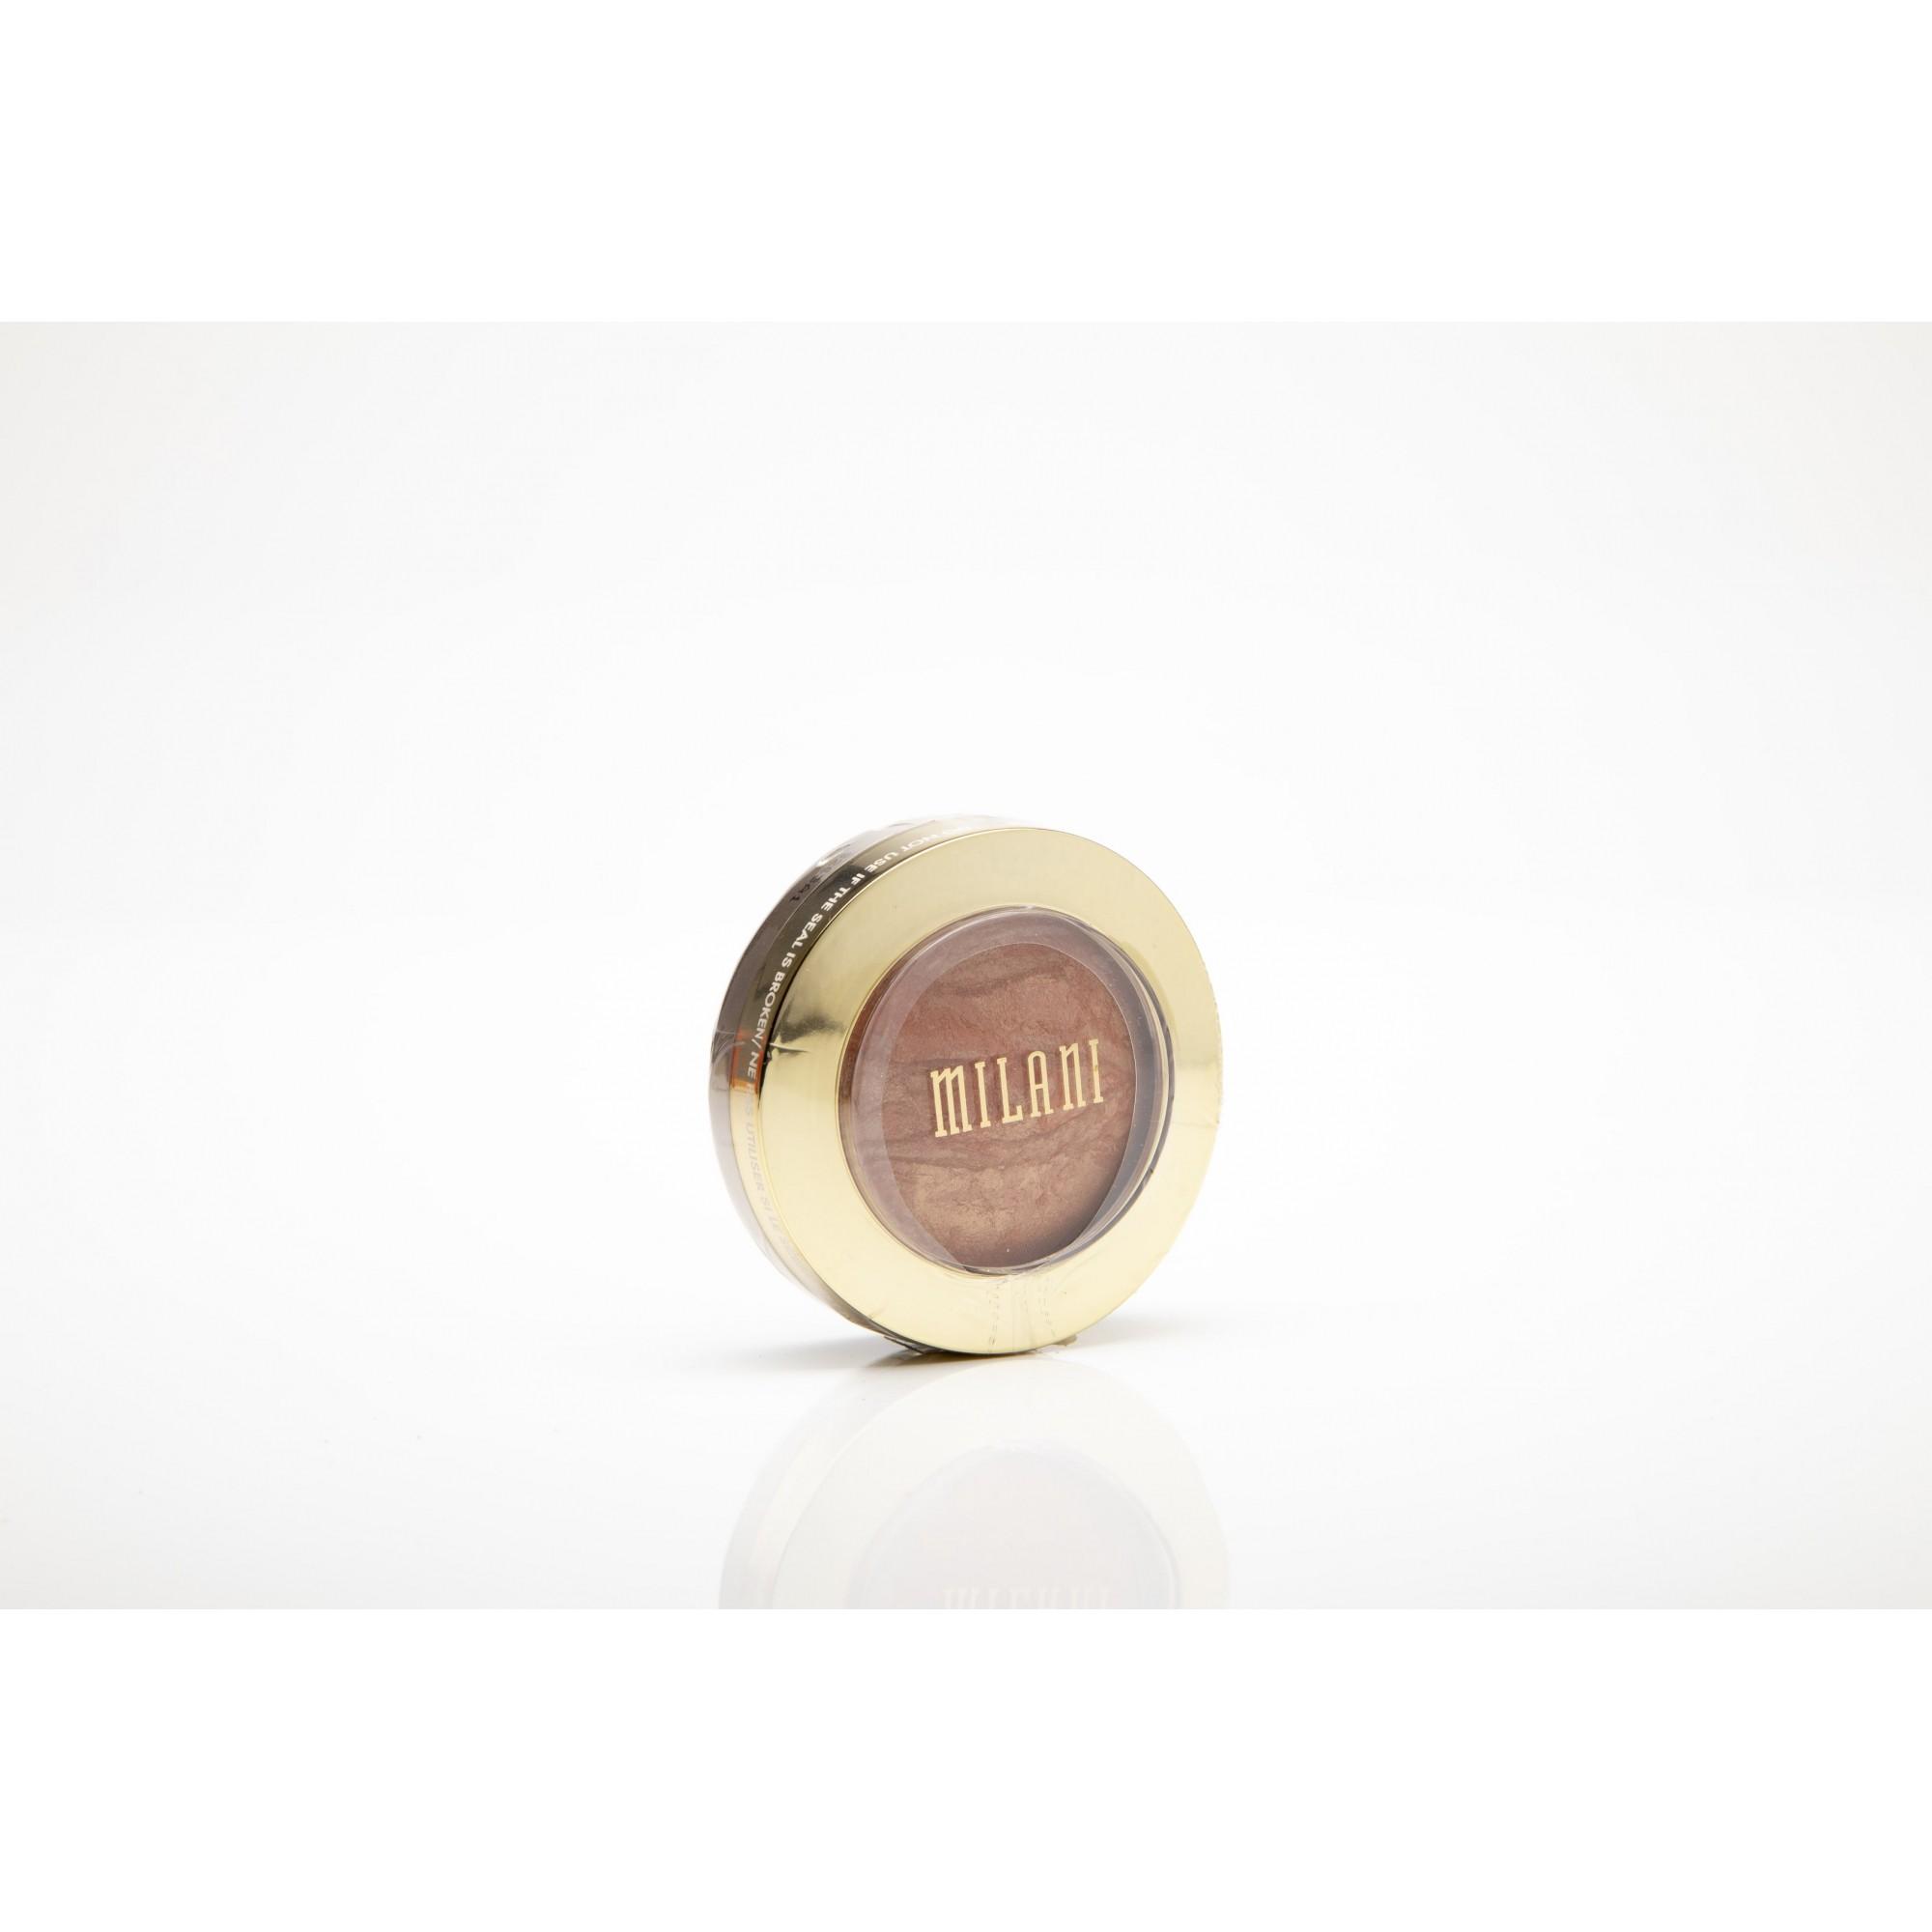 Blush milani 06 belissimo bronze